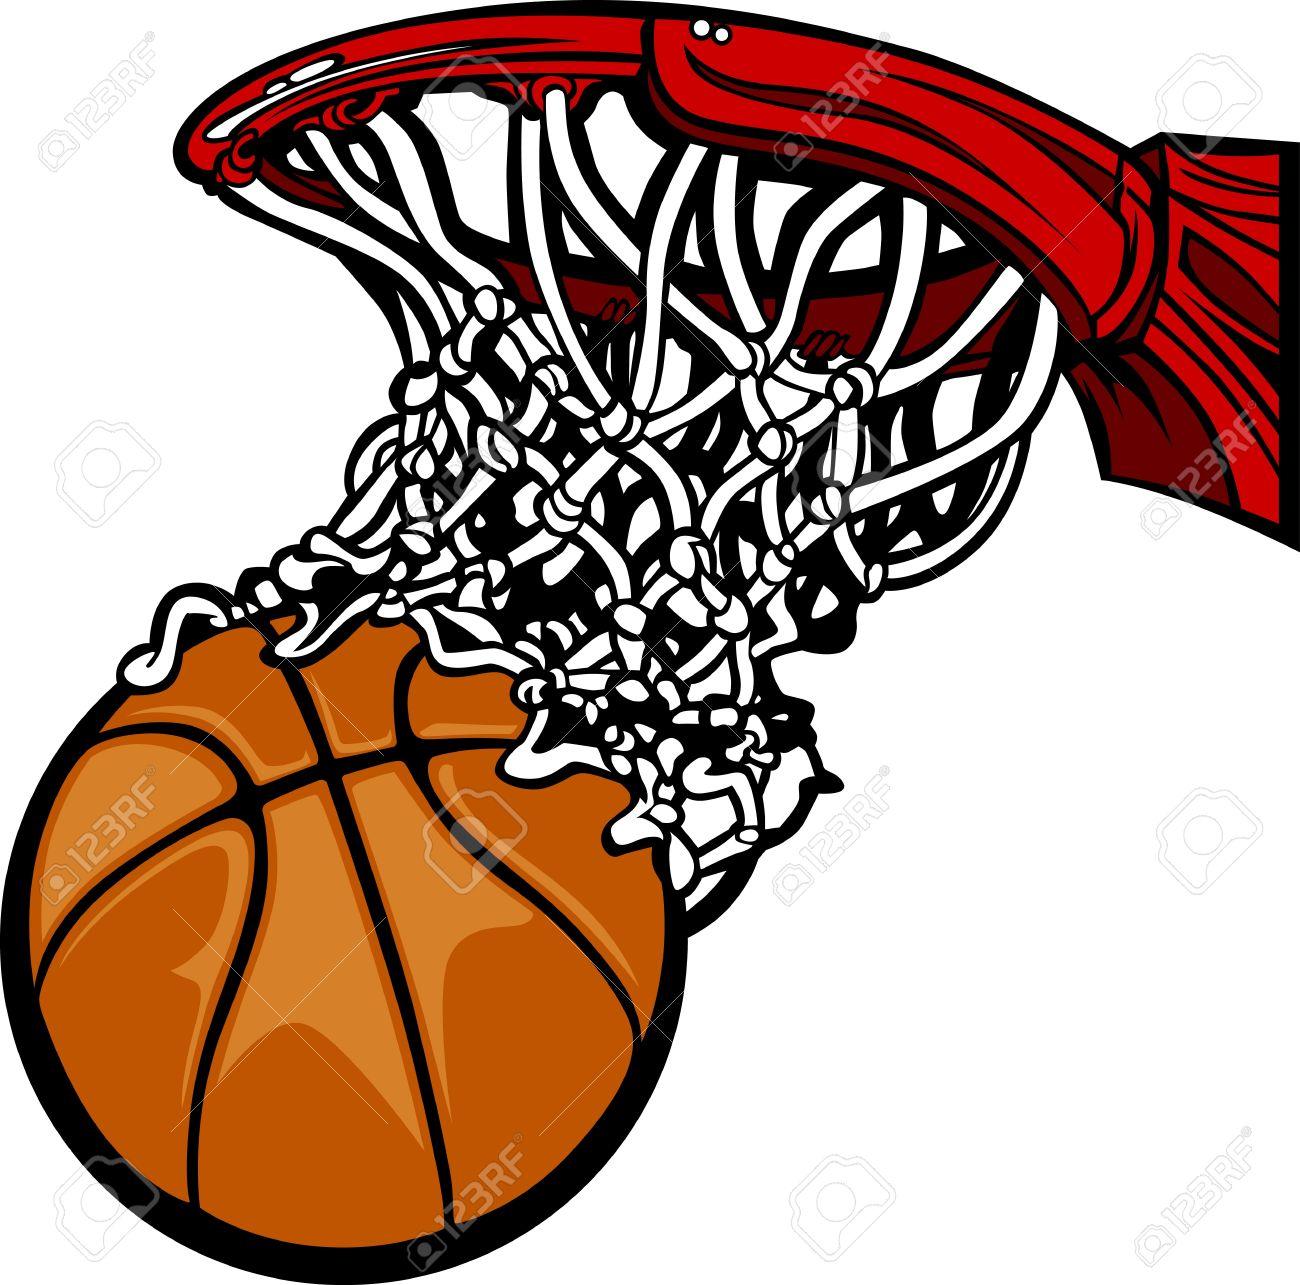 1300x1285 Basketball Hoop With Basketball Cartoon Royalty Free Cliparts